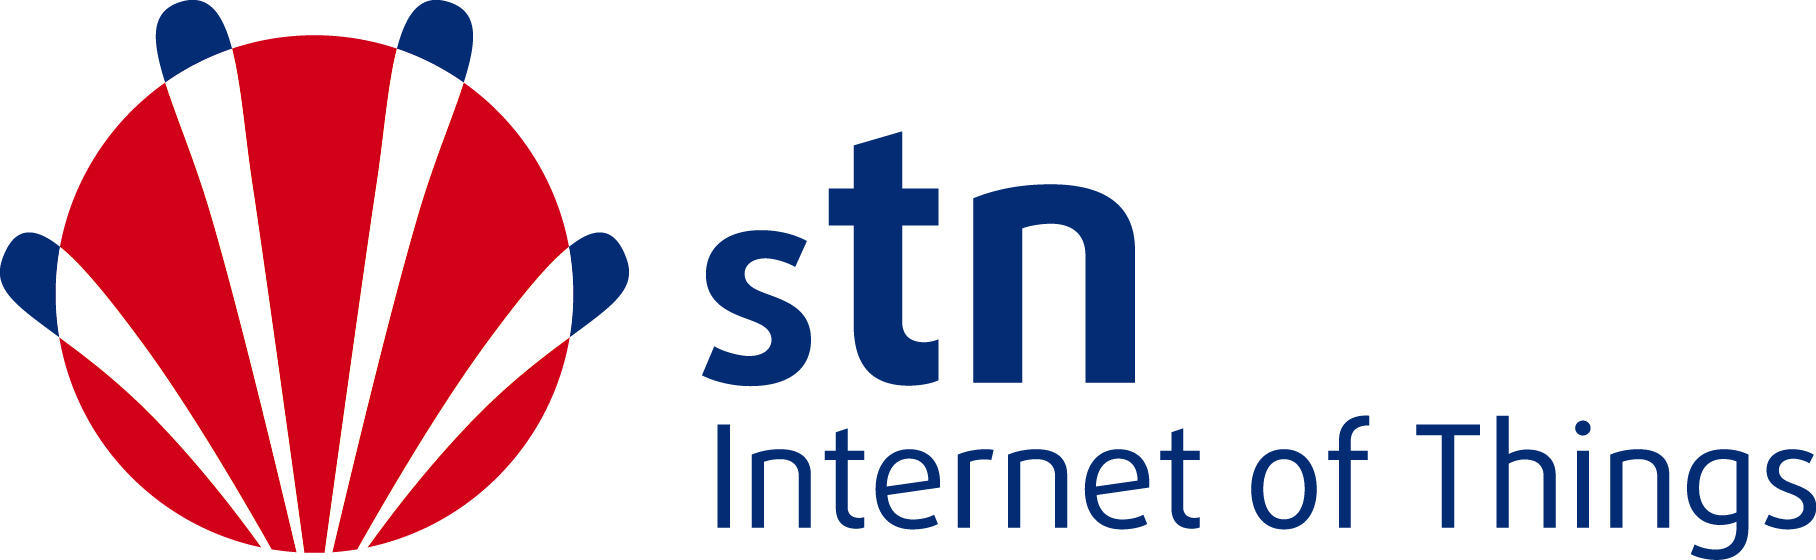 sTN Telefact